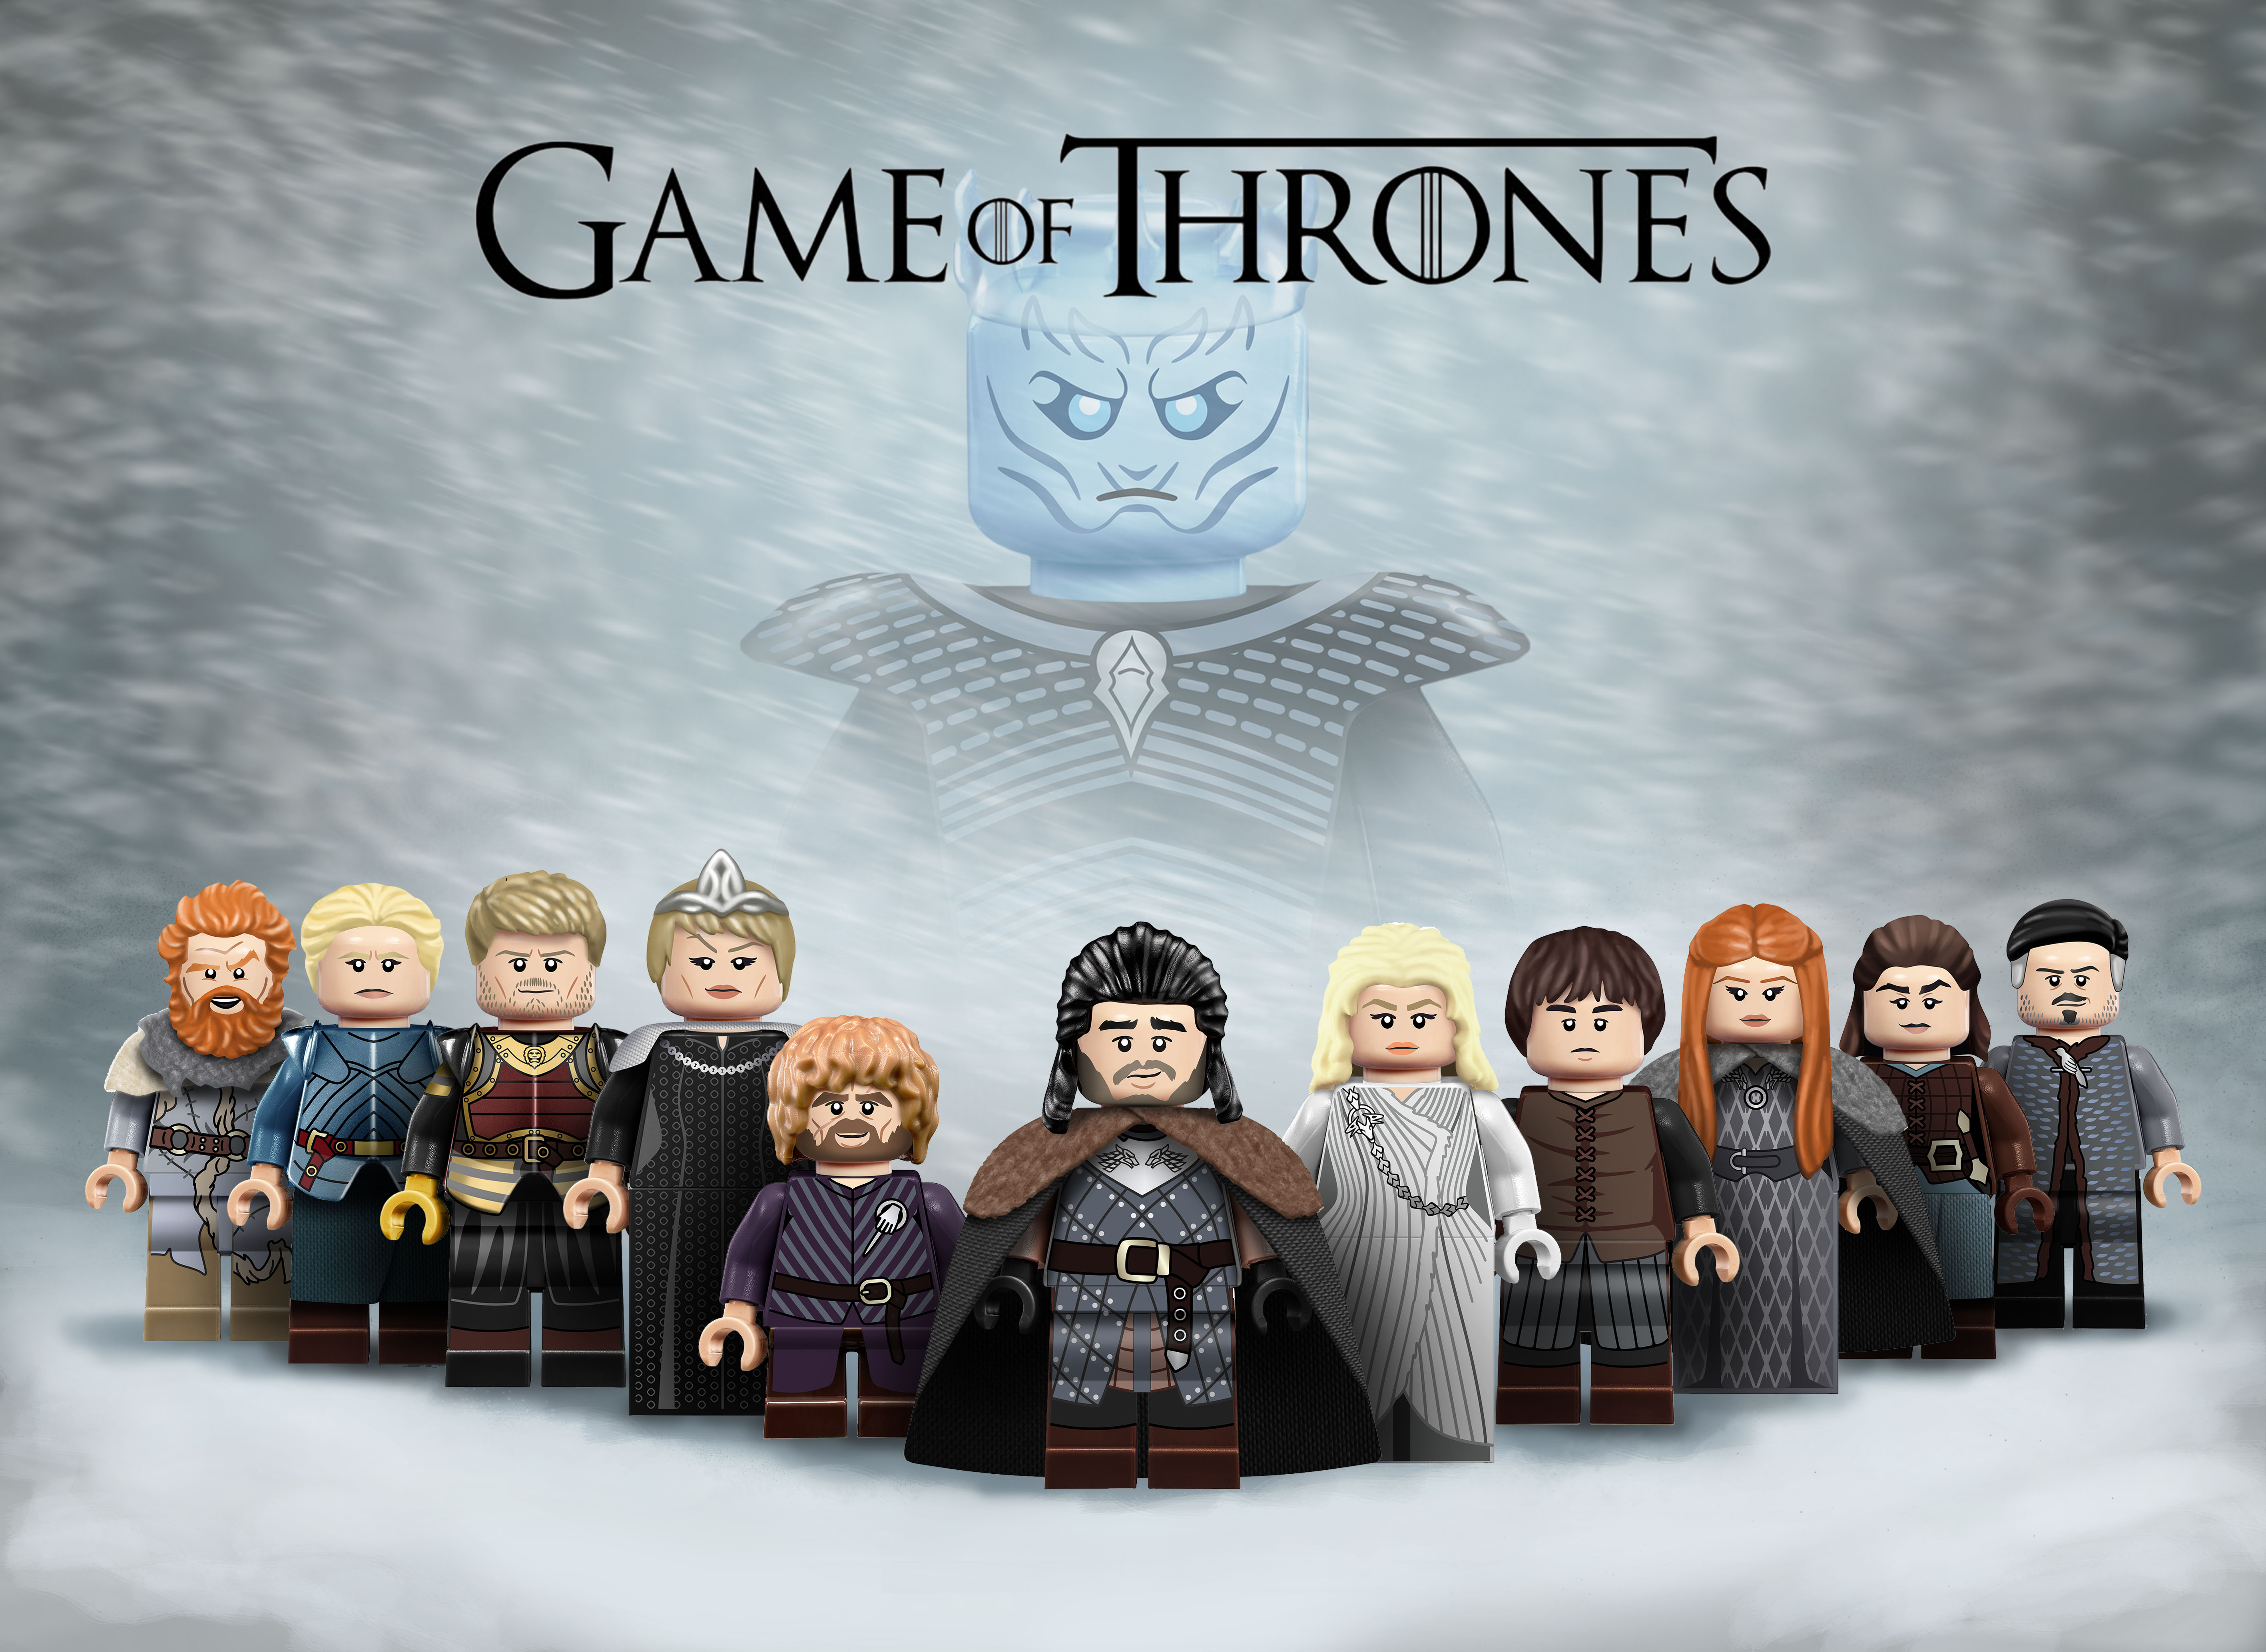 Wallpaper Lego Game of Thrones